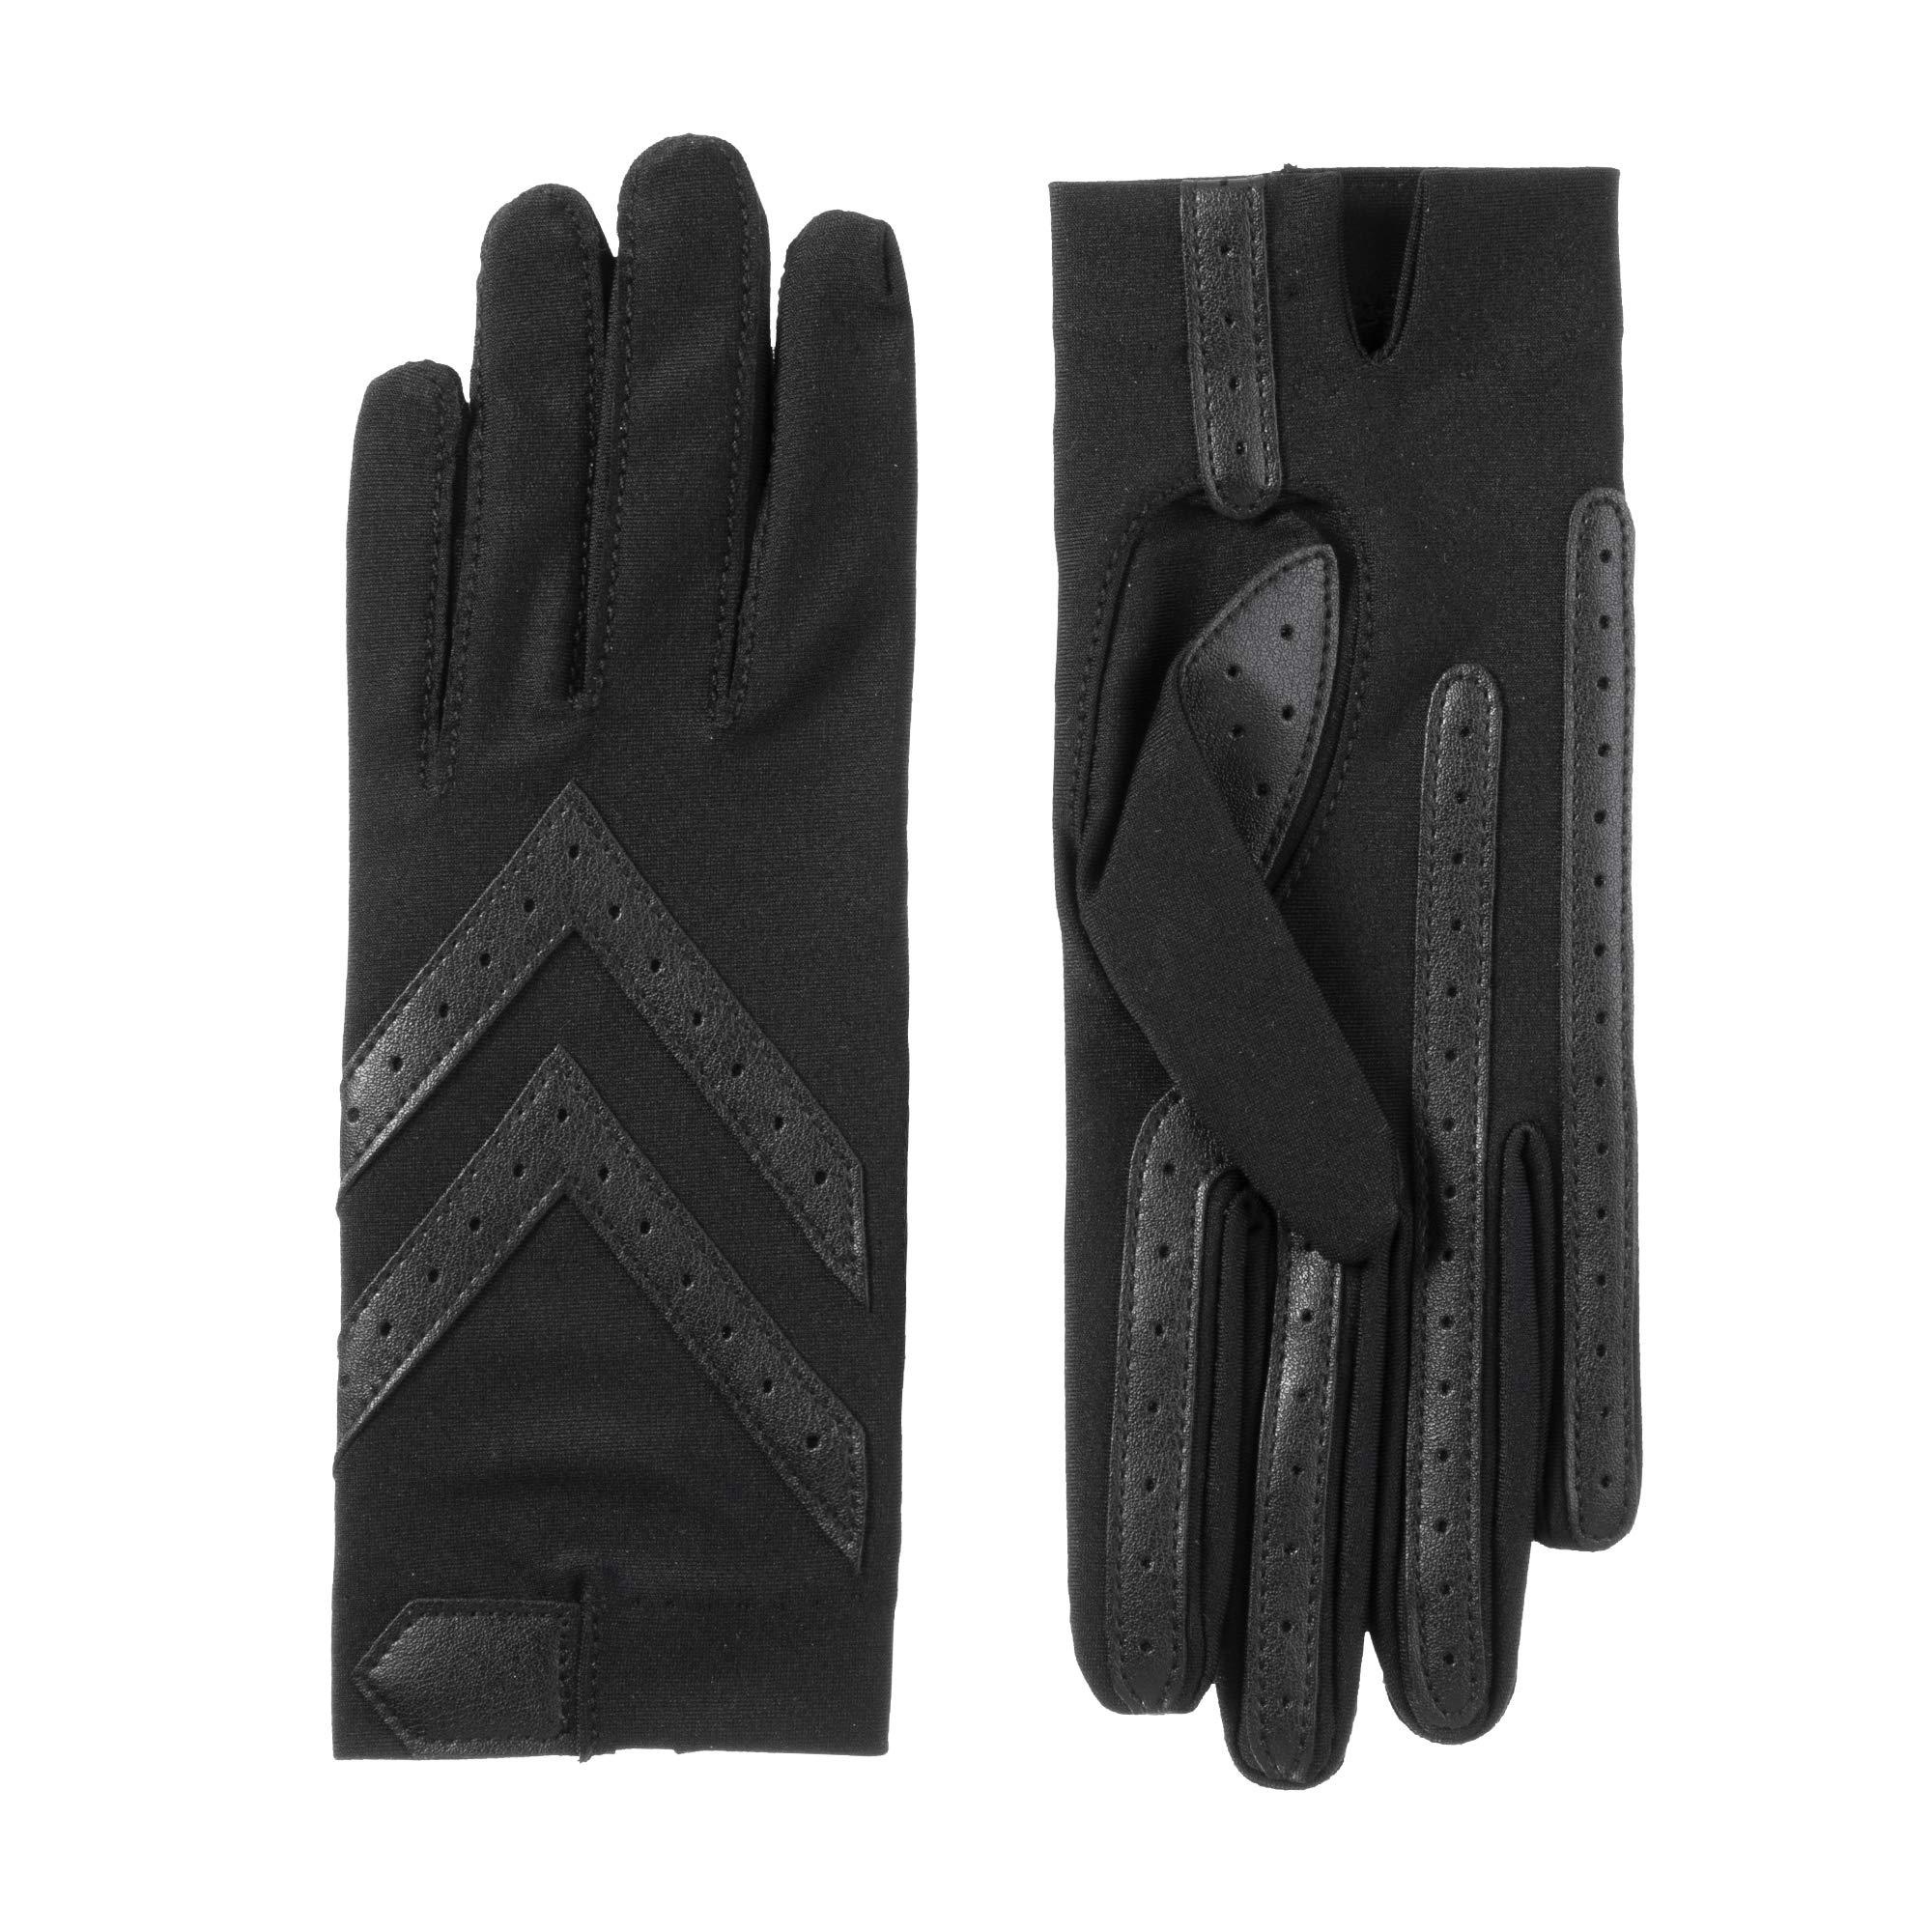 isotoner Chevron Spandex Women's Gloves, Touchscreen, Black, S/M